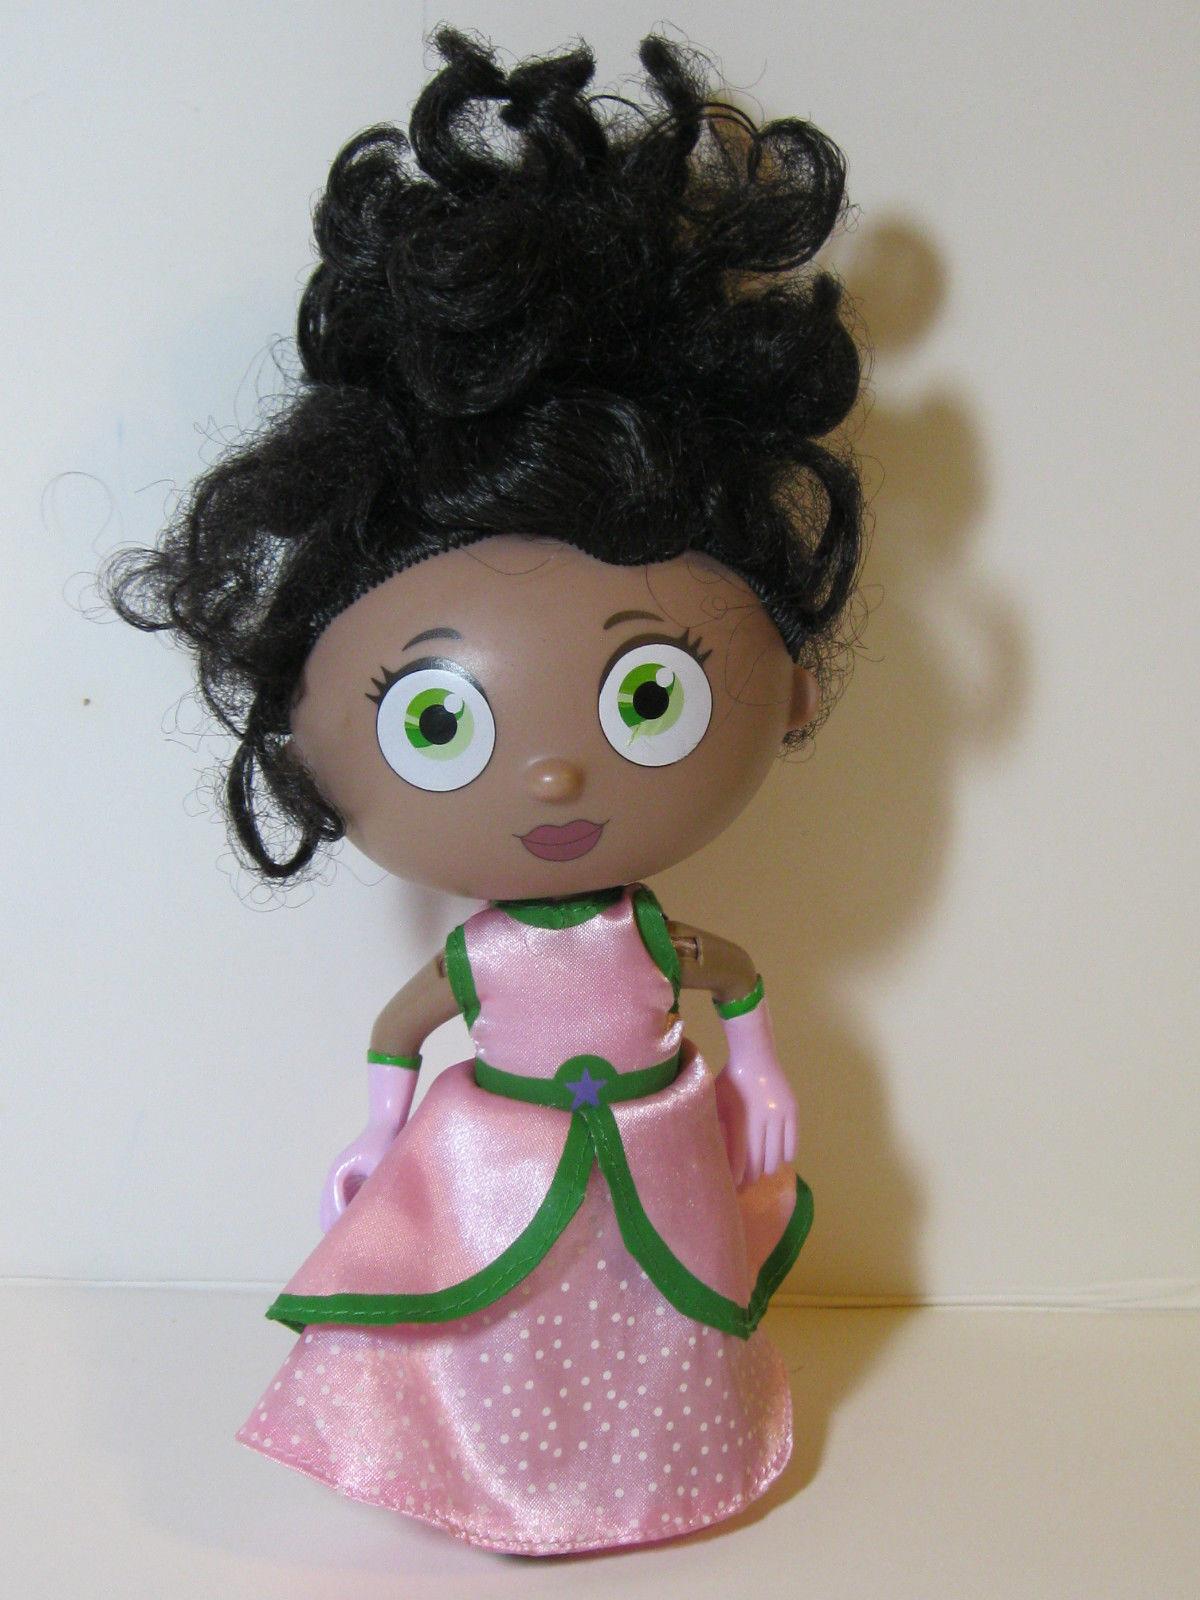 Super Why Princess Pea Princess Presto Pbs Kids Style